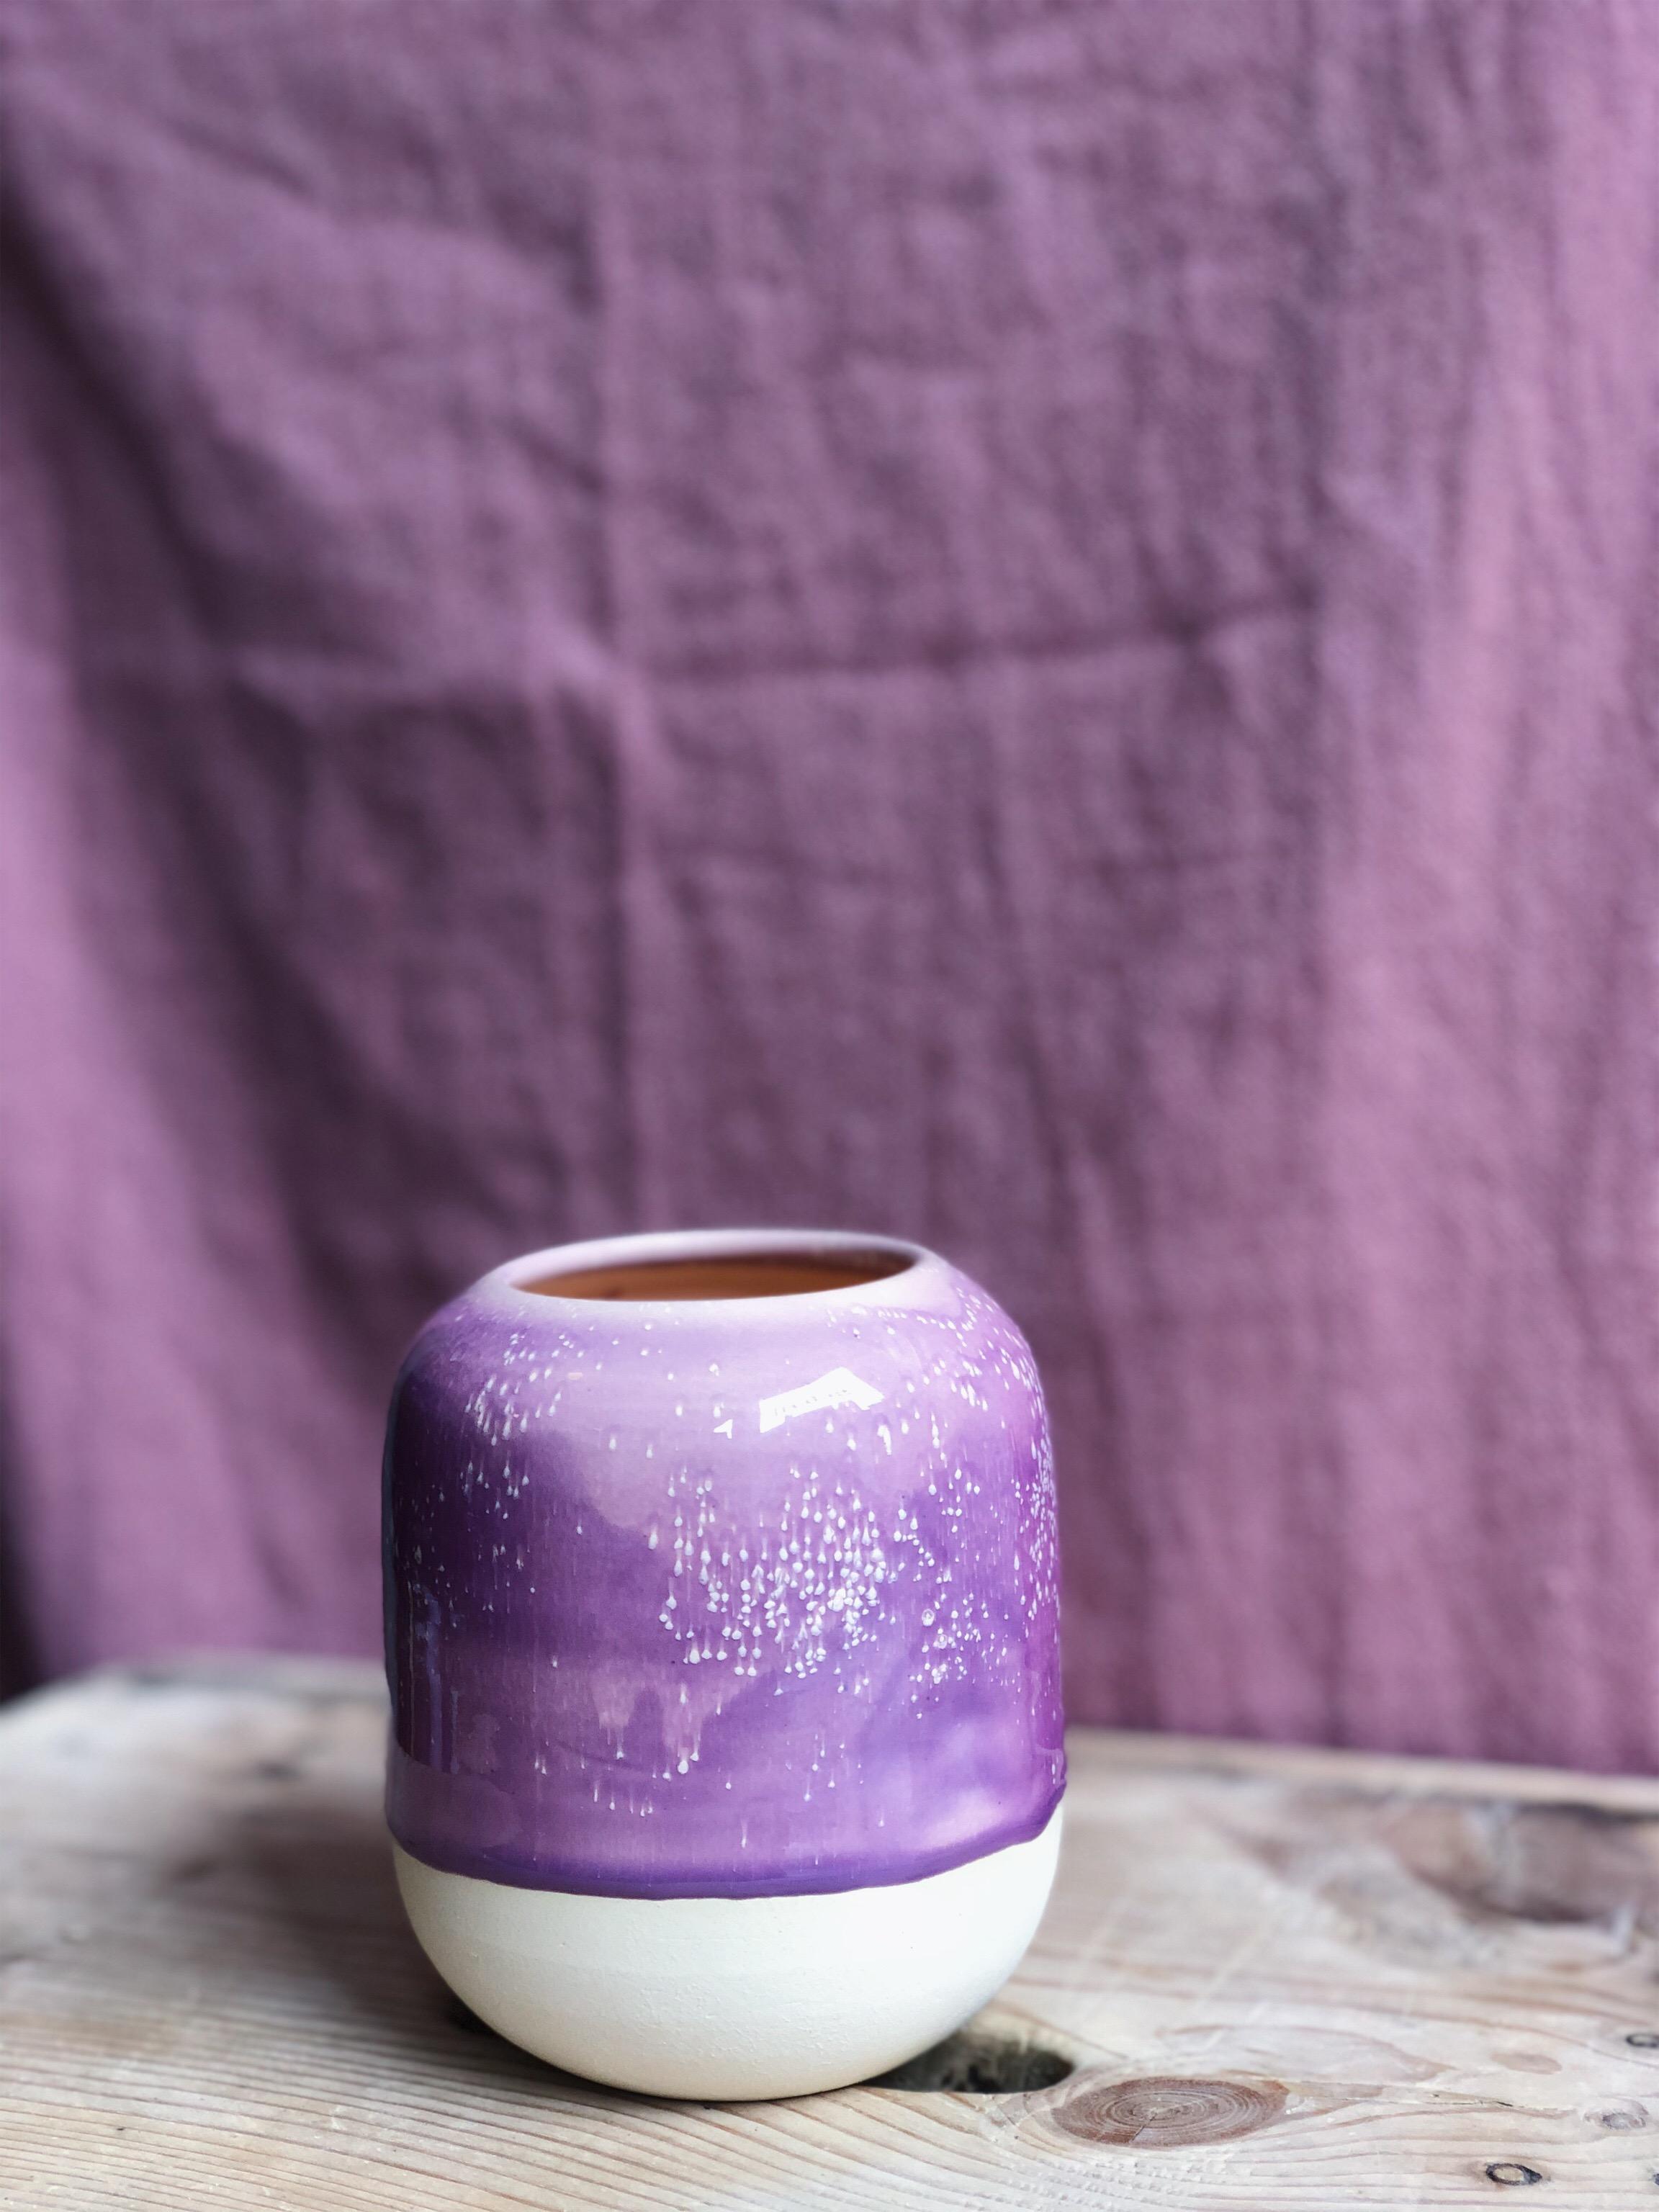 STUDIO ARHØJ - Pen Cup, Orchid Jam